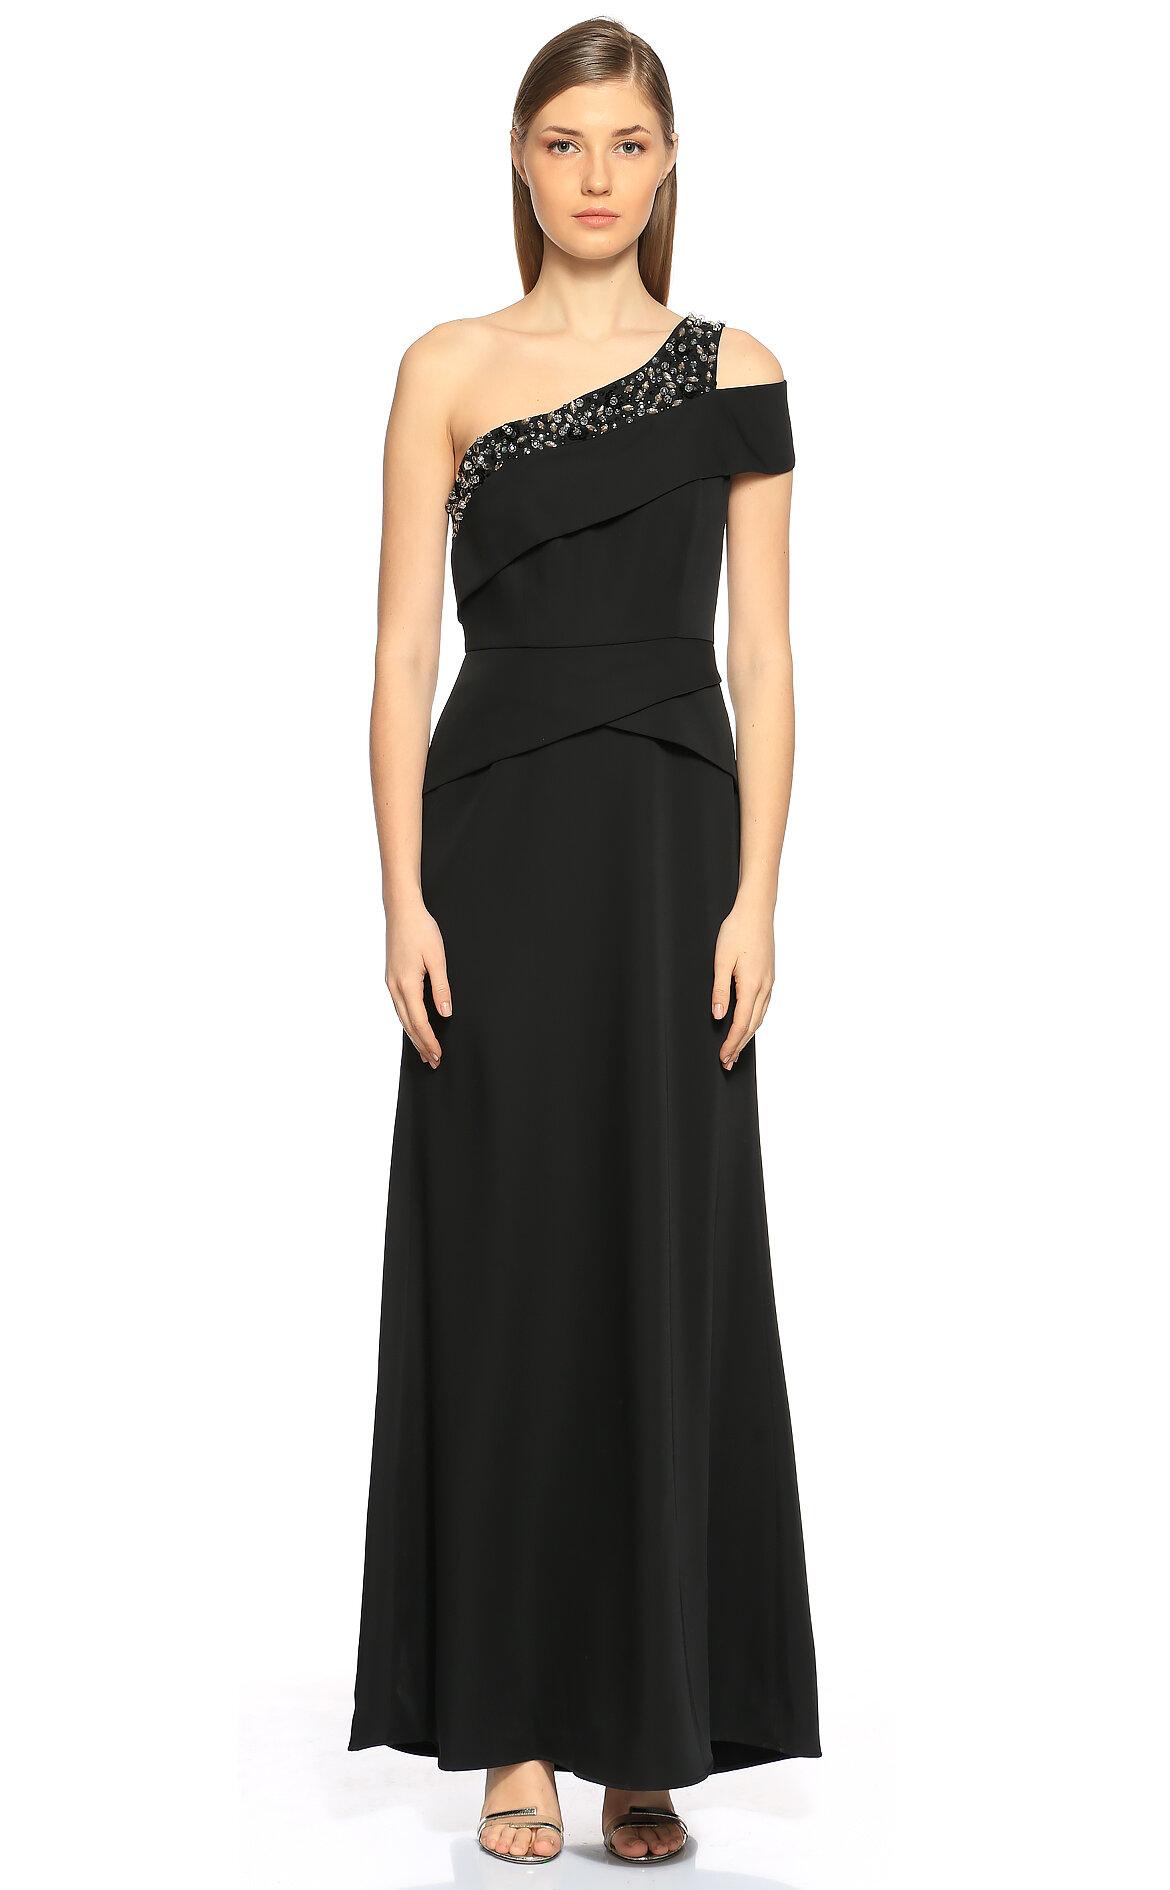 BCBG MAX AZRIA-BCBG MAX AZRIA İşlemeli Tek Kollu Siyah Gece Elbisesi